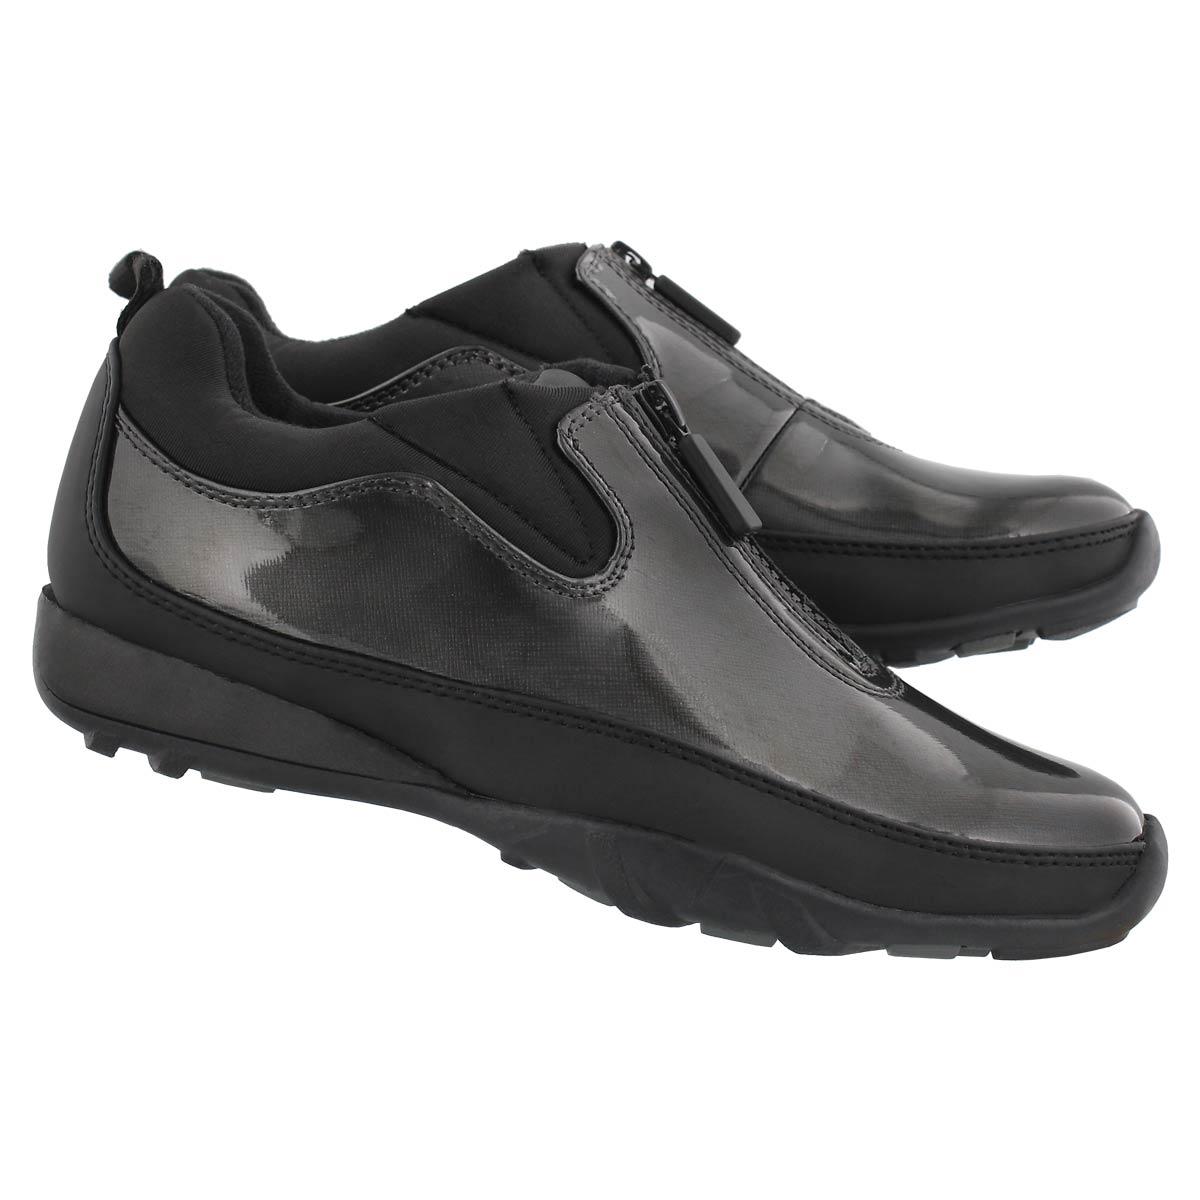 Lds Howdoo graph pat front zip rain shoe